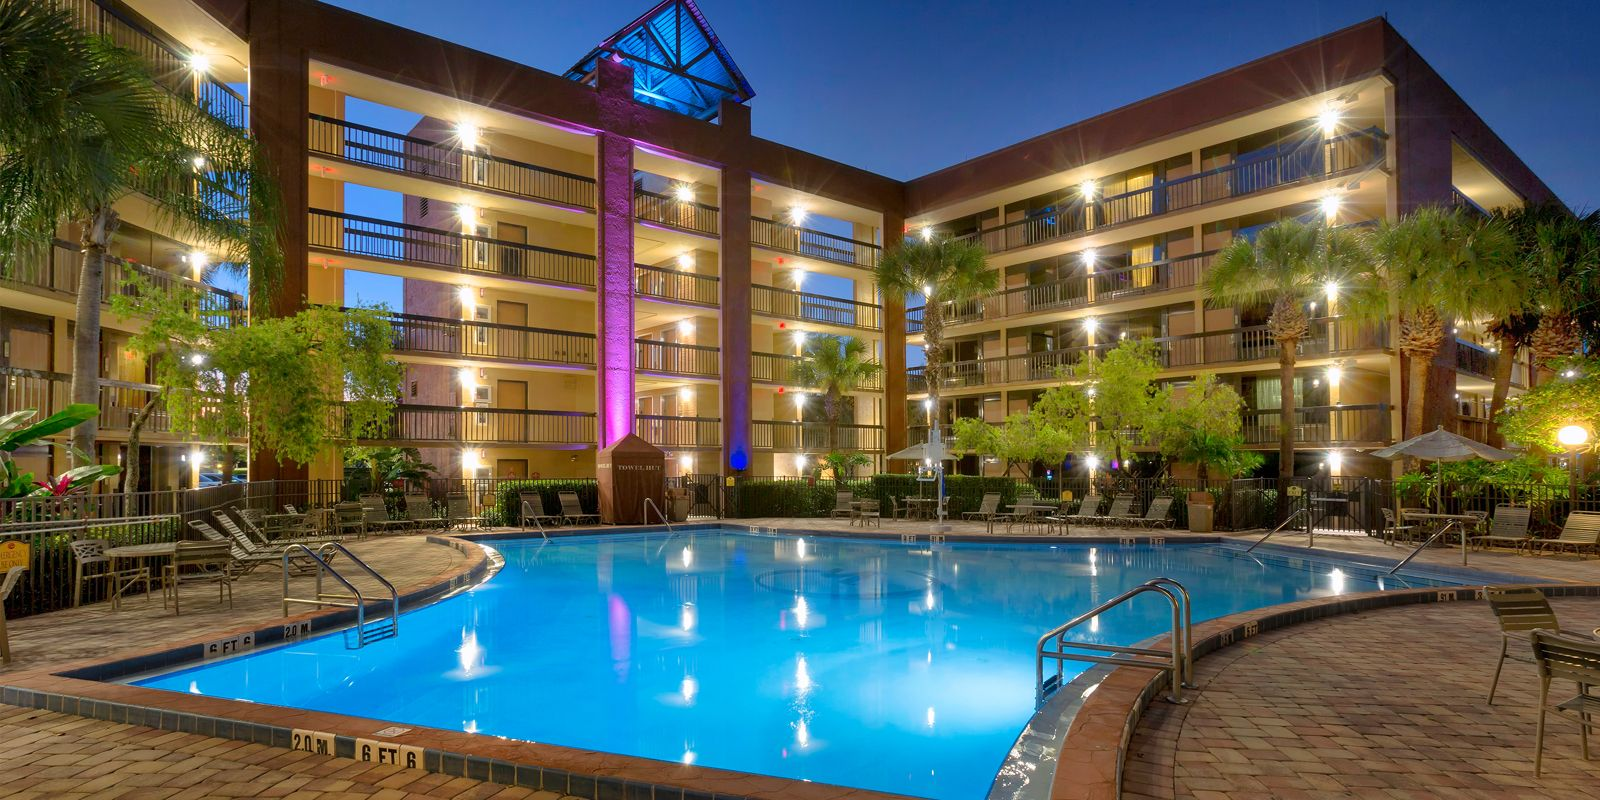 Lake Buena Vista Hotel | Value Hotel near Disney World in ...